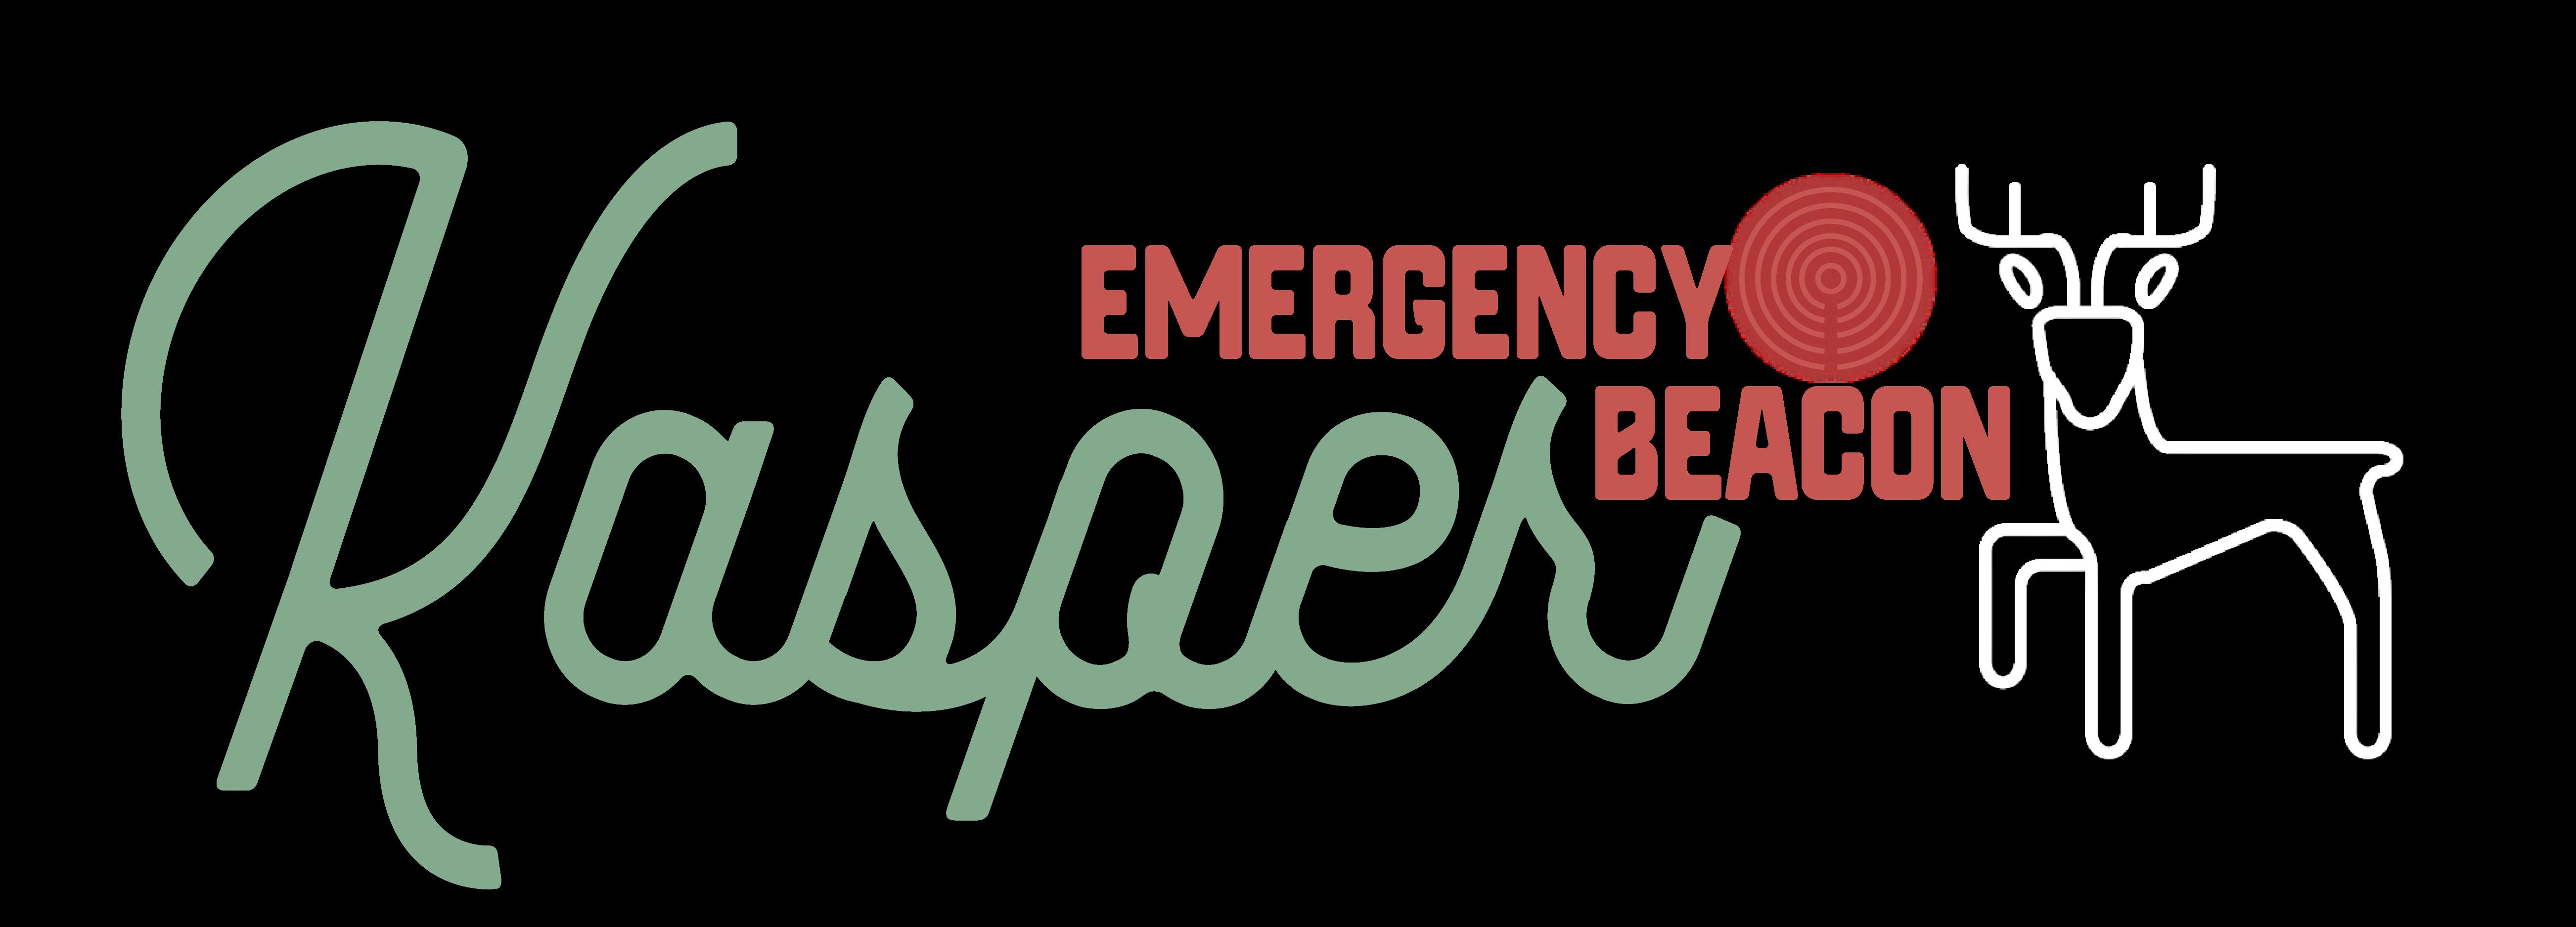 beacon_kasper_logo-01